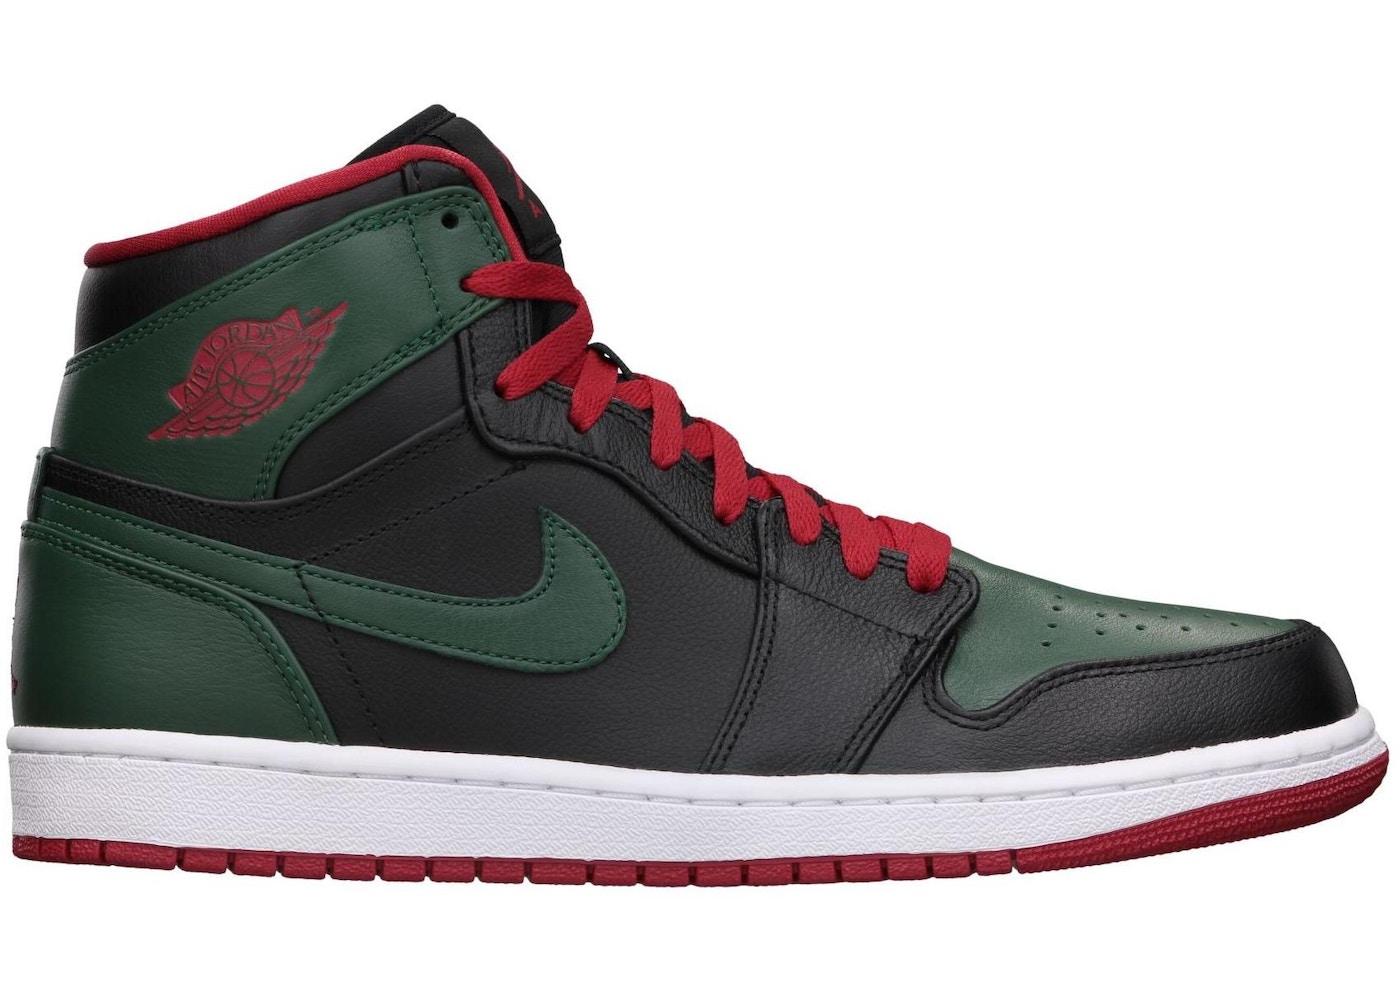 uk availability 698ef ceaac Jordan 1 Retro Green Gucci